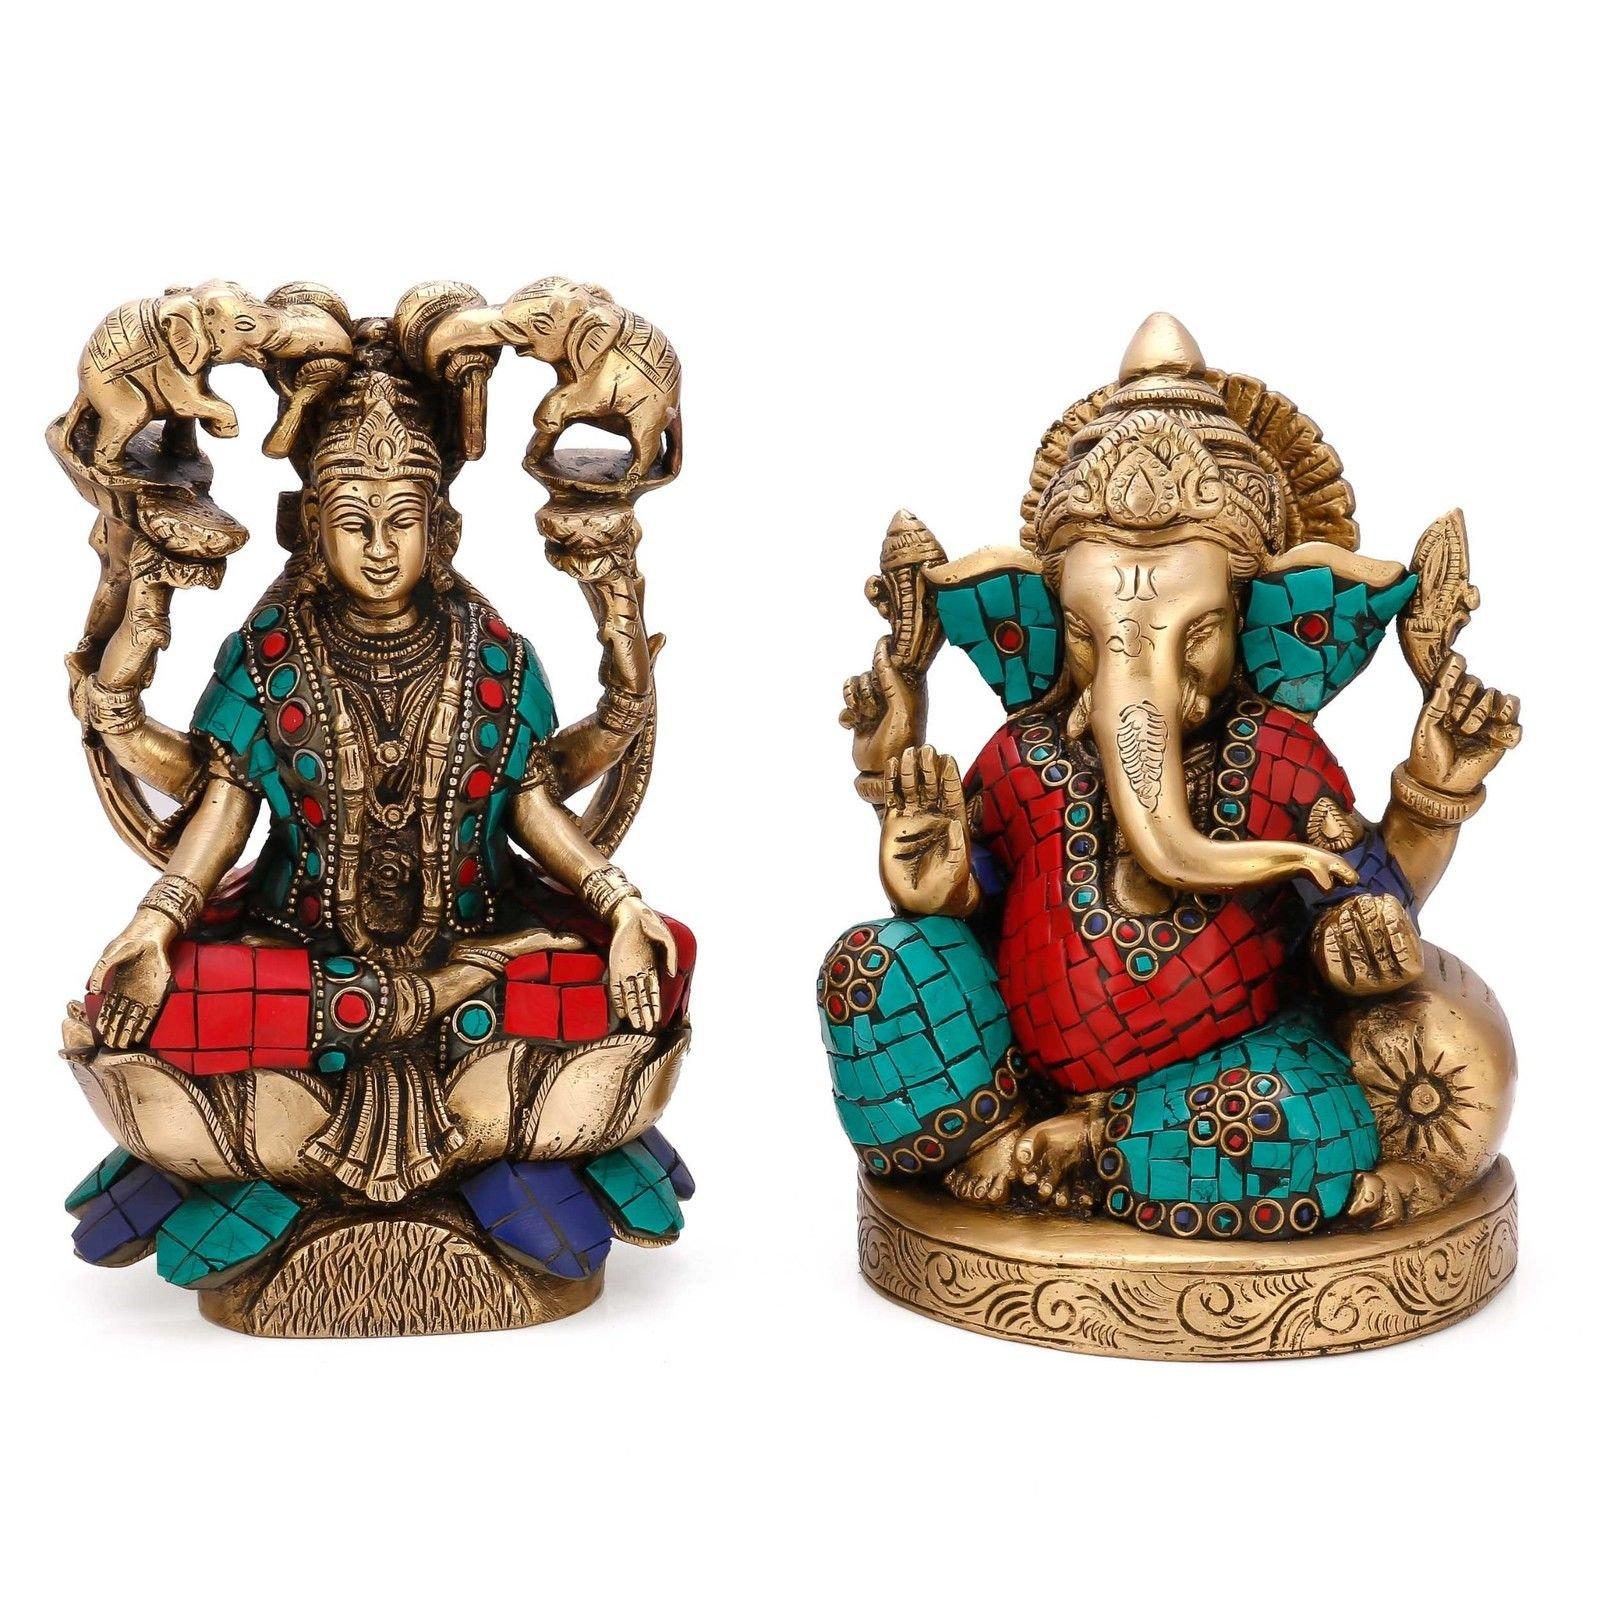 Lord Ganesh & Goddess Lakshmi Statue Set of Hindu God Idol Turquoise Brass India Laxmi Ganesha Decor Gifts